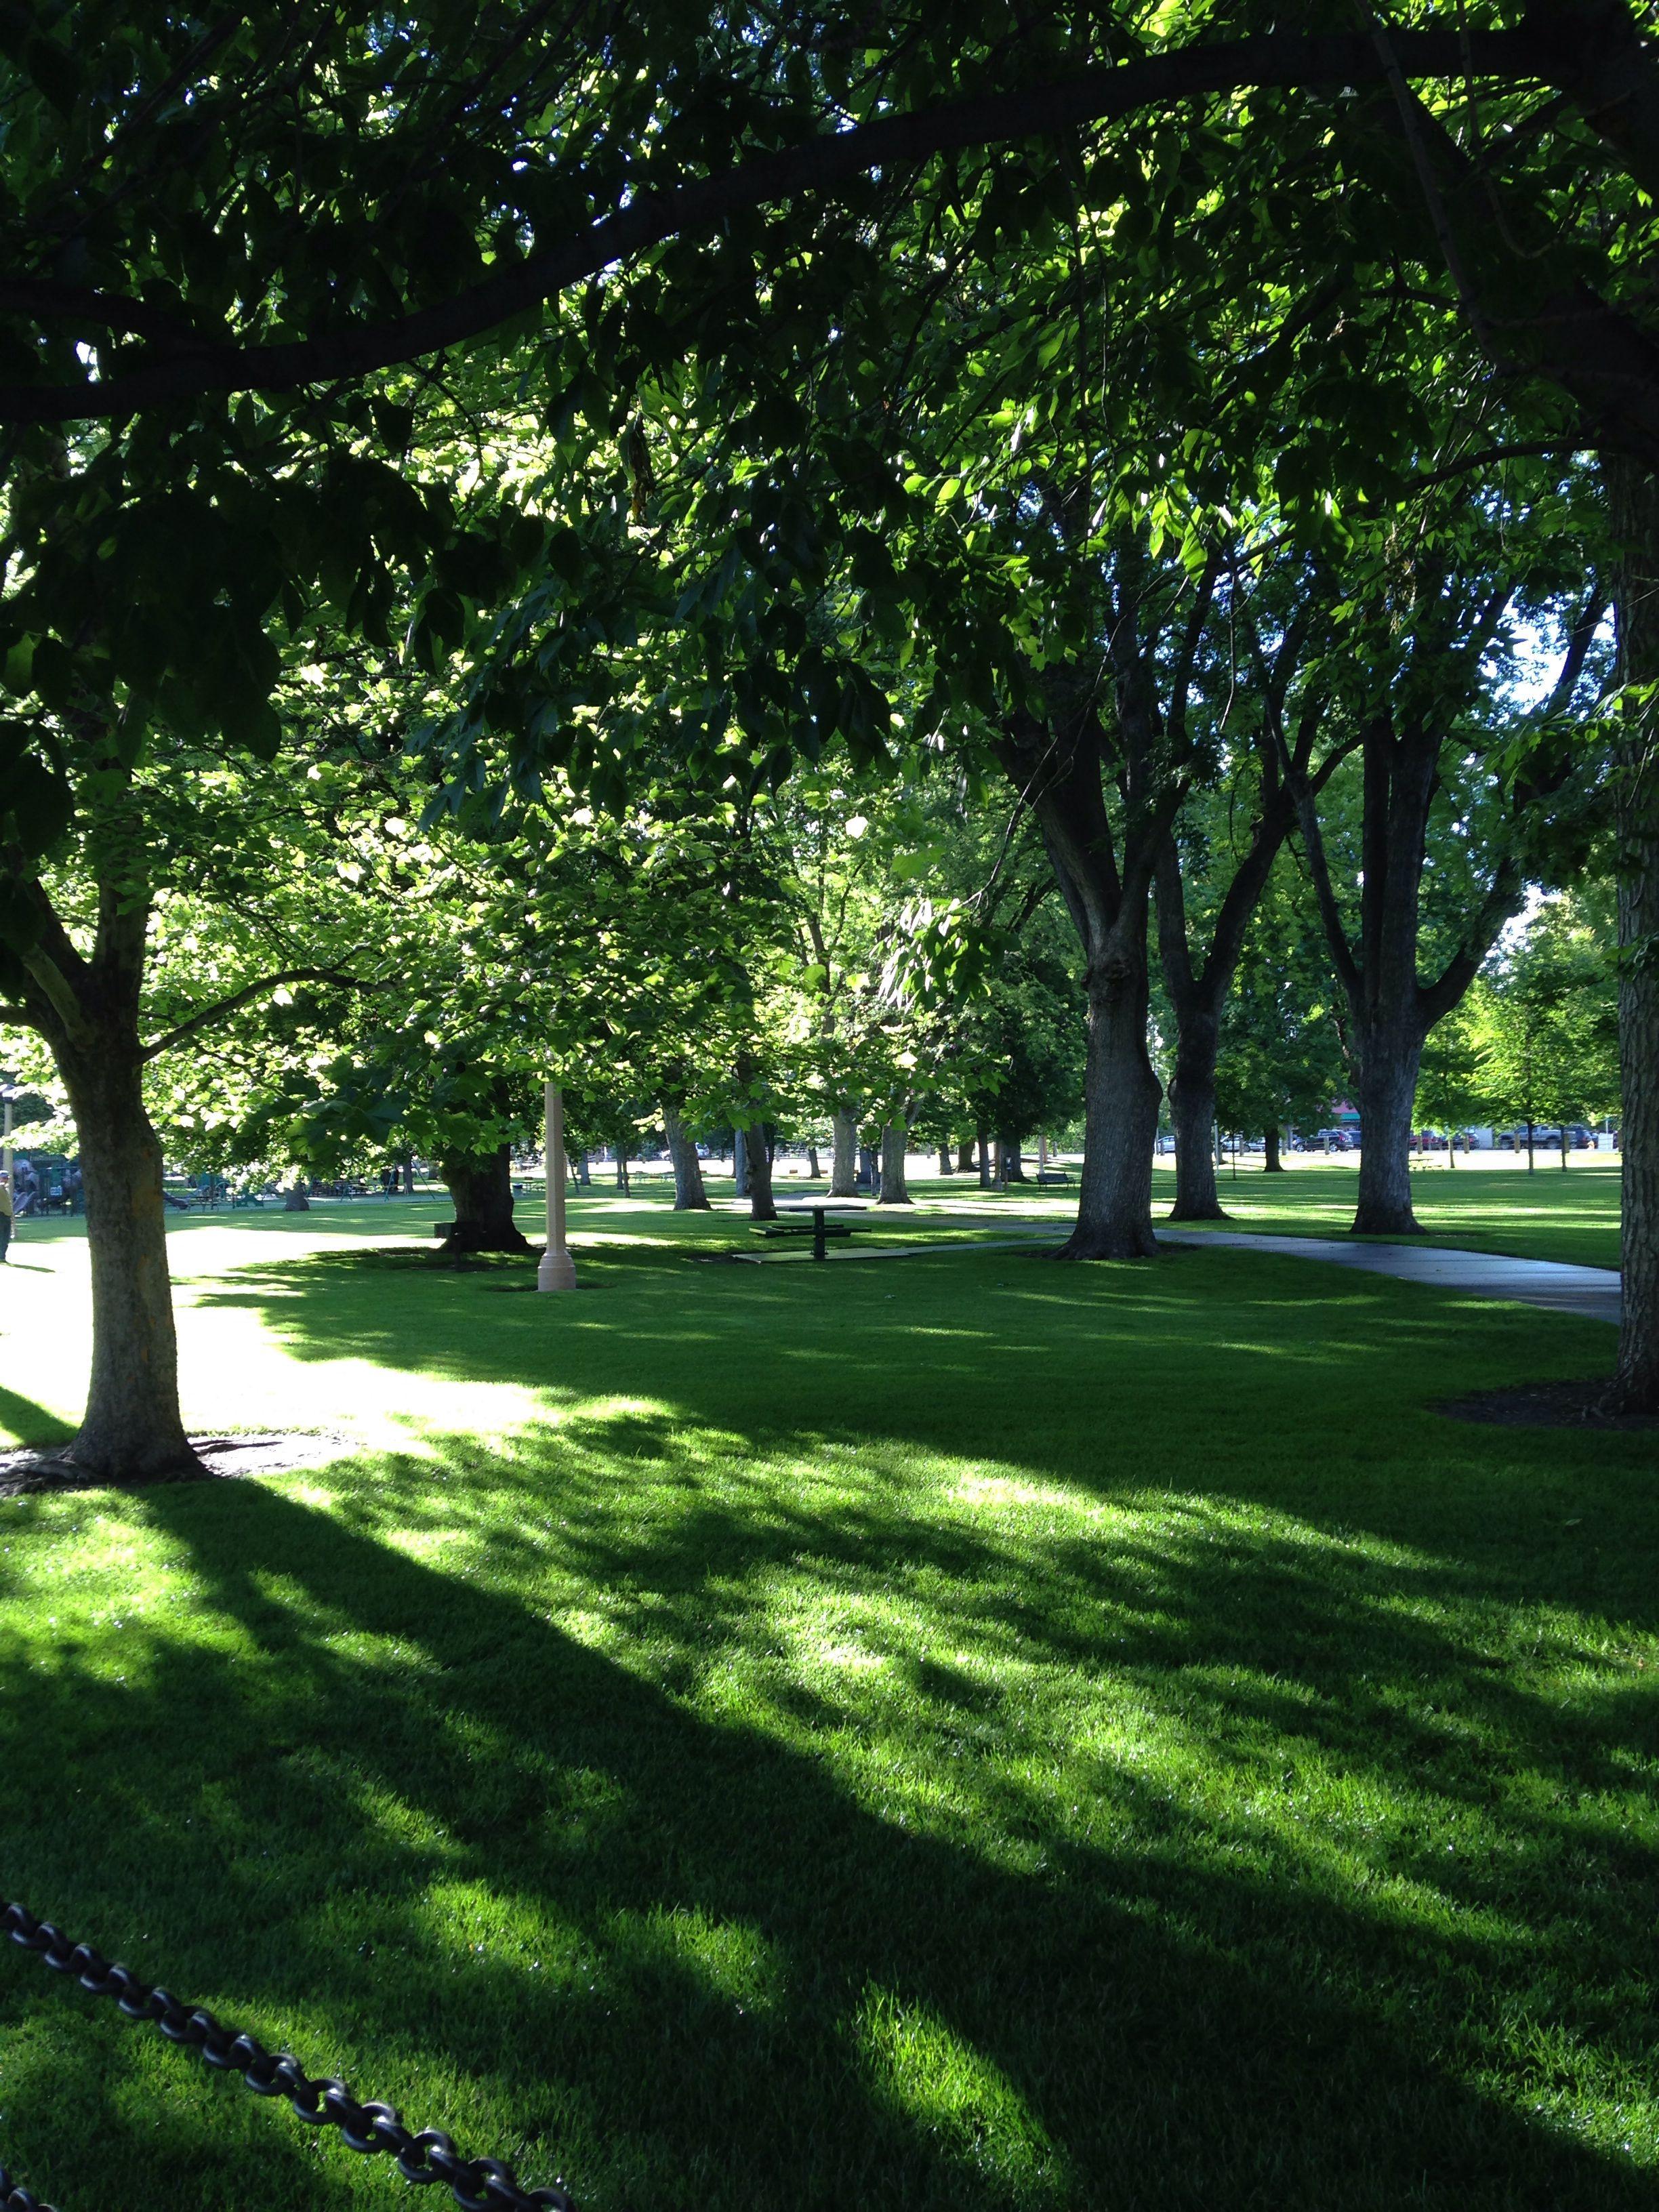 Geiser Pollman Park in beautiful bakercity.